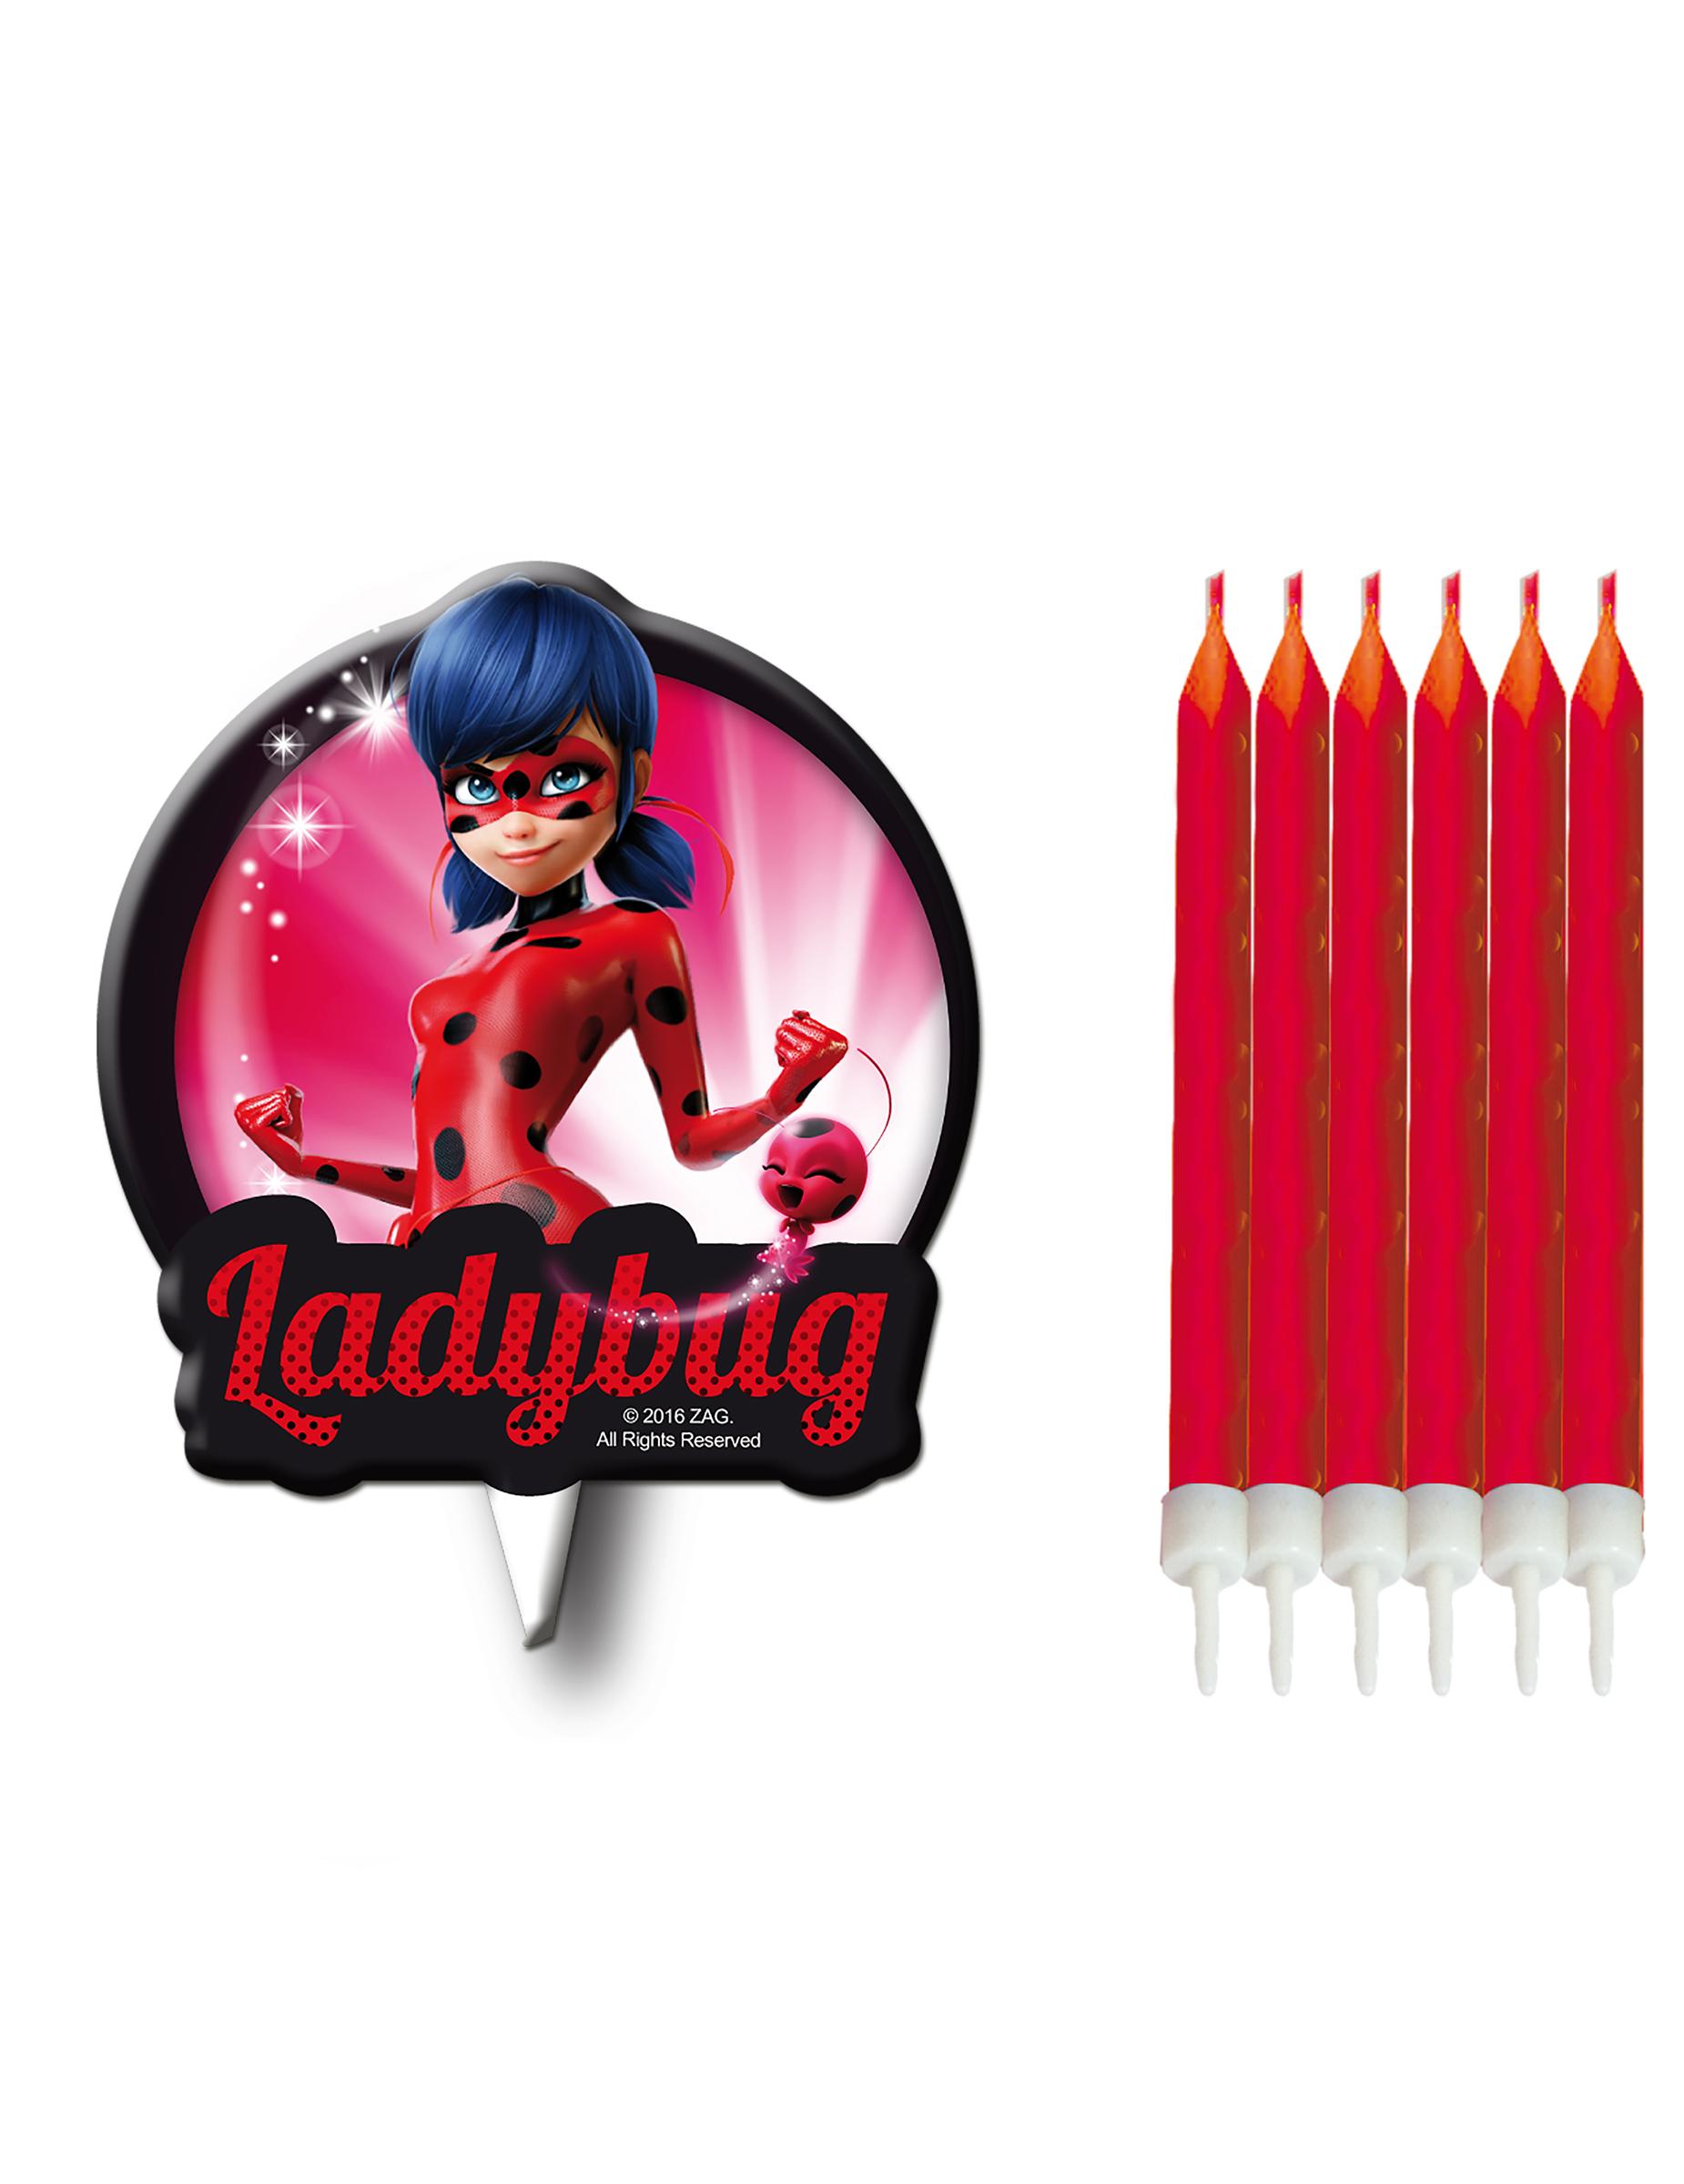 ladybug™kerzenset 7 stueck rotbunt  günstige faschings